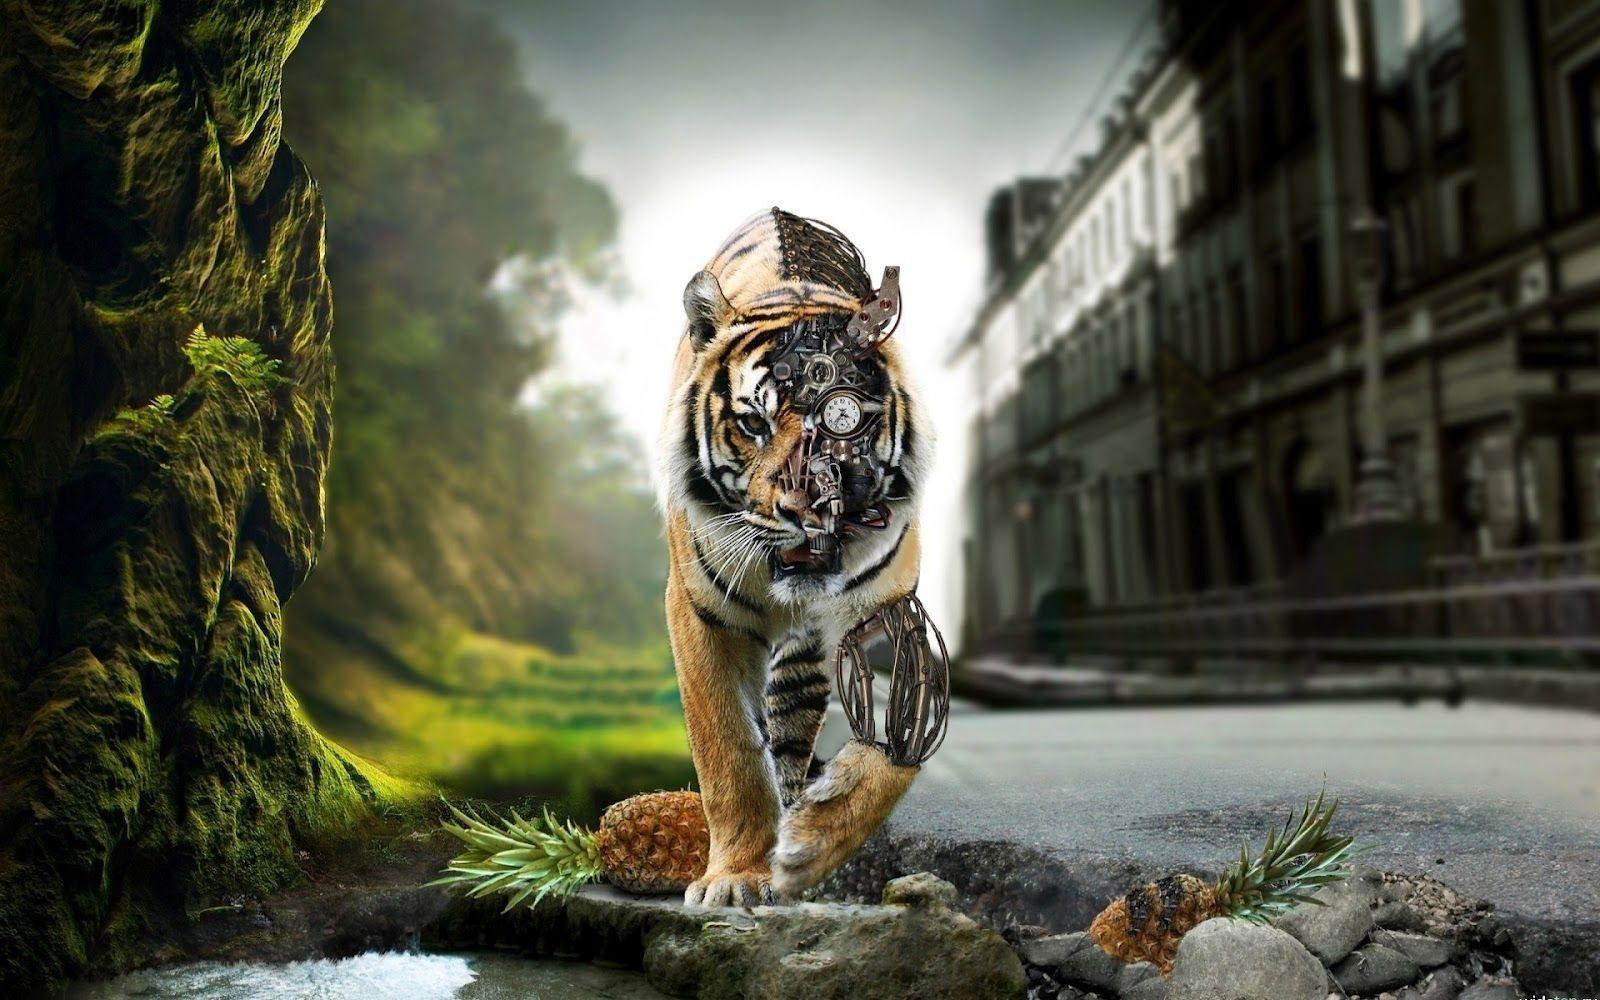 Wallpapers For > Tiger Wallpaper Hd For Desktop